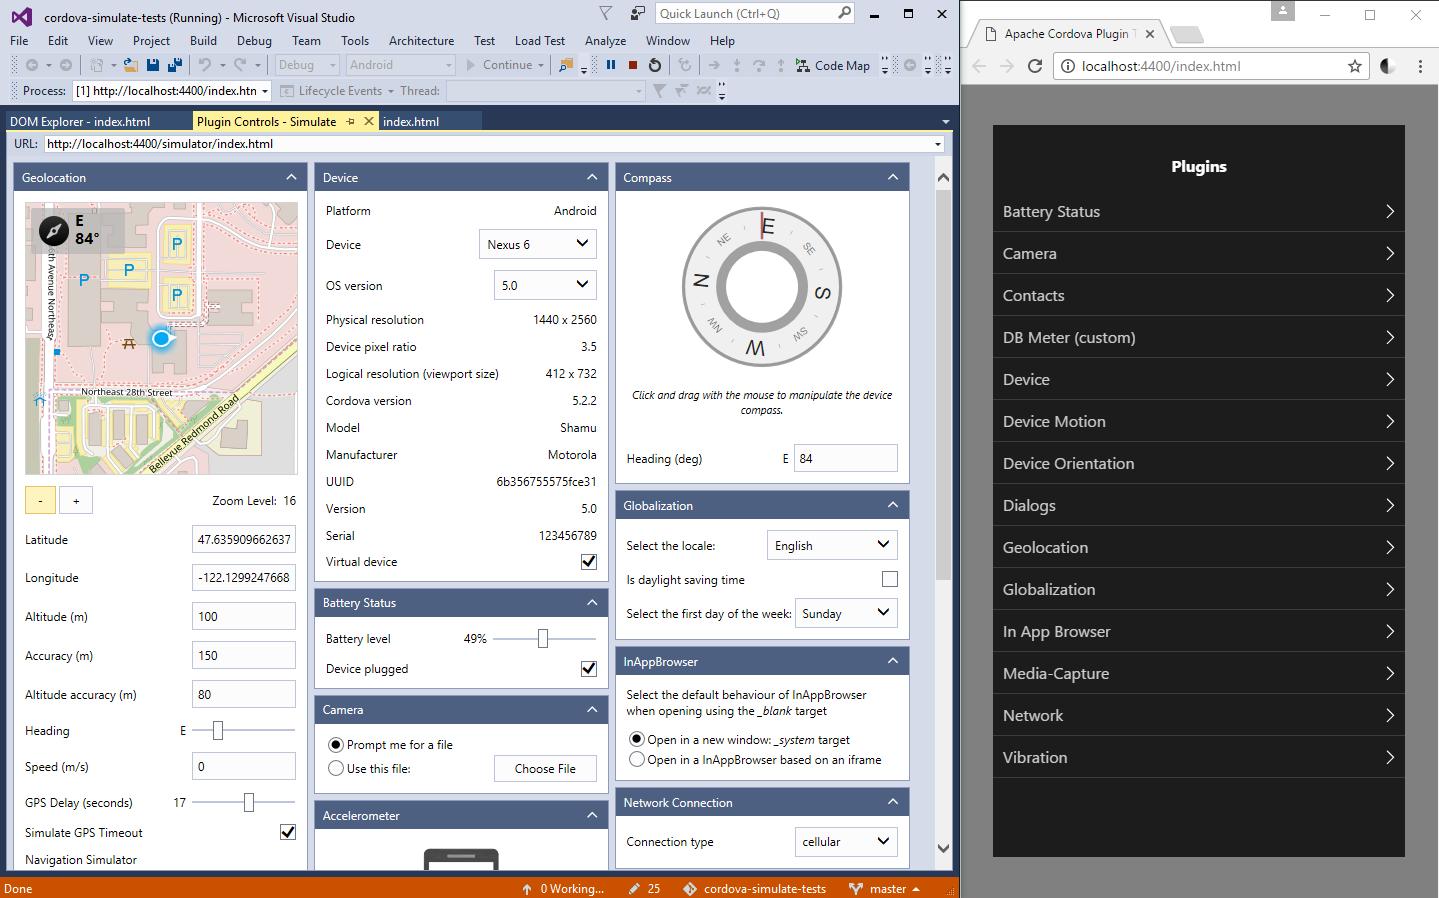 Visual Studio Cordova Tools Get Faster Builds, Debugging -- ADTmag